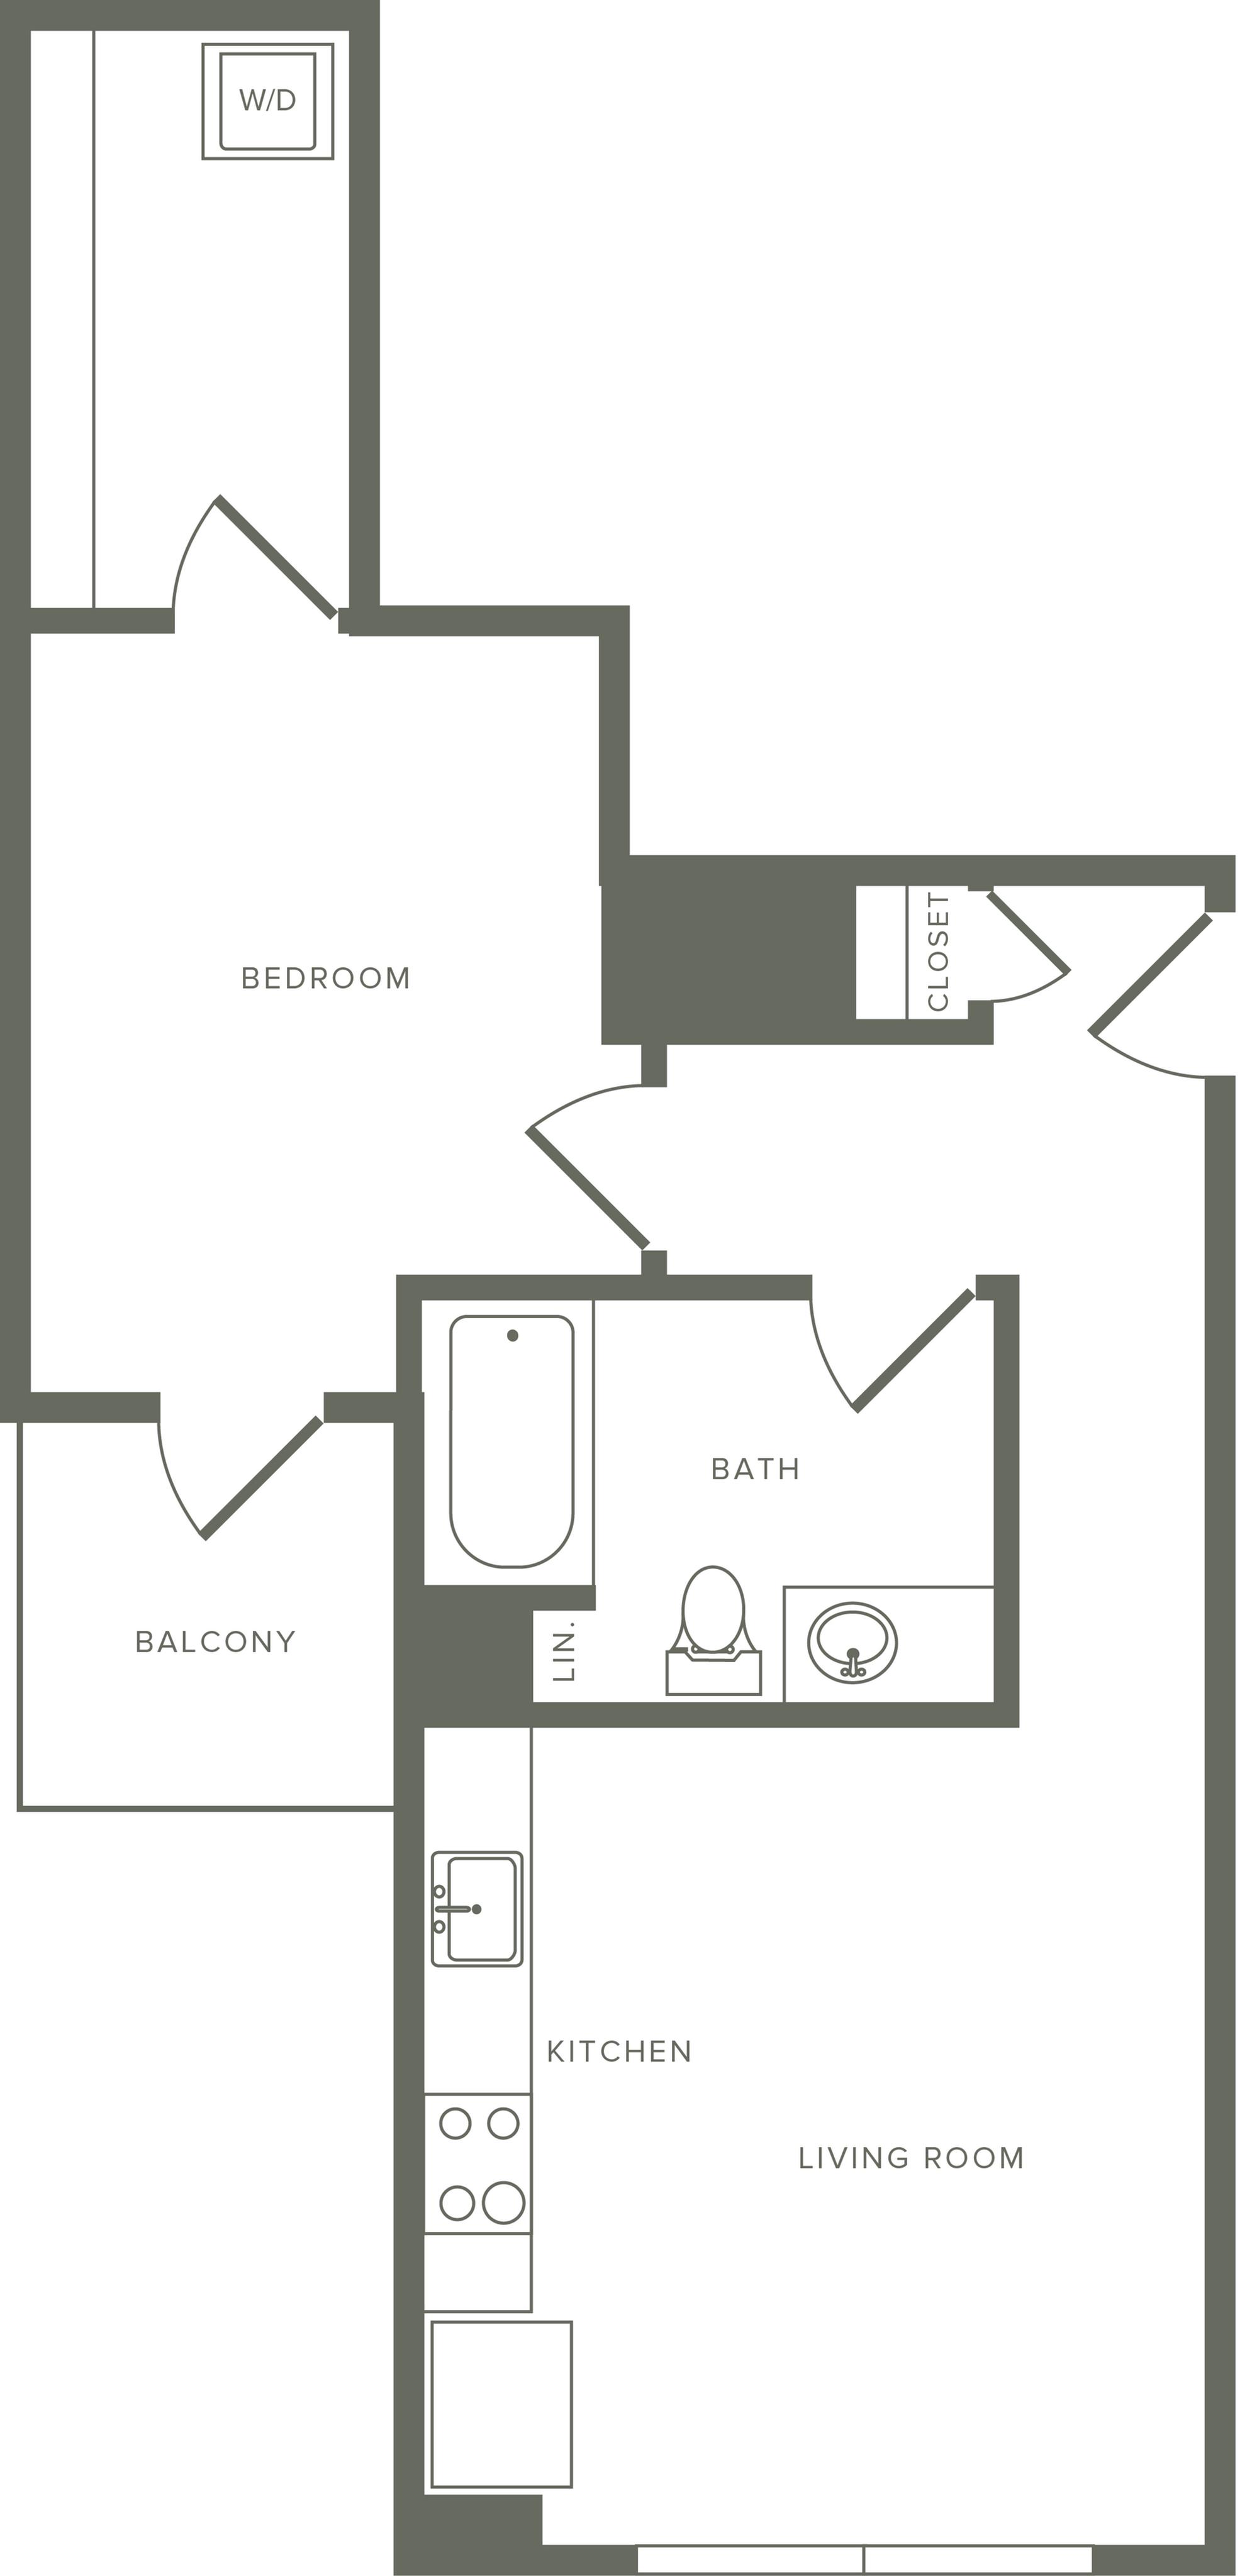 656 square foot one bedroom one bath floor plan image